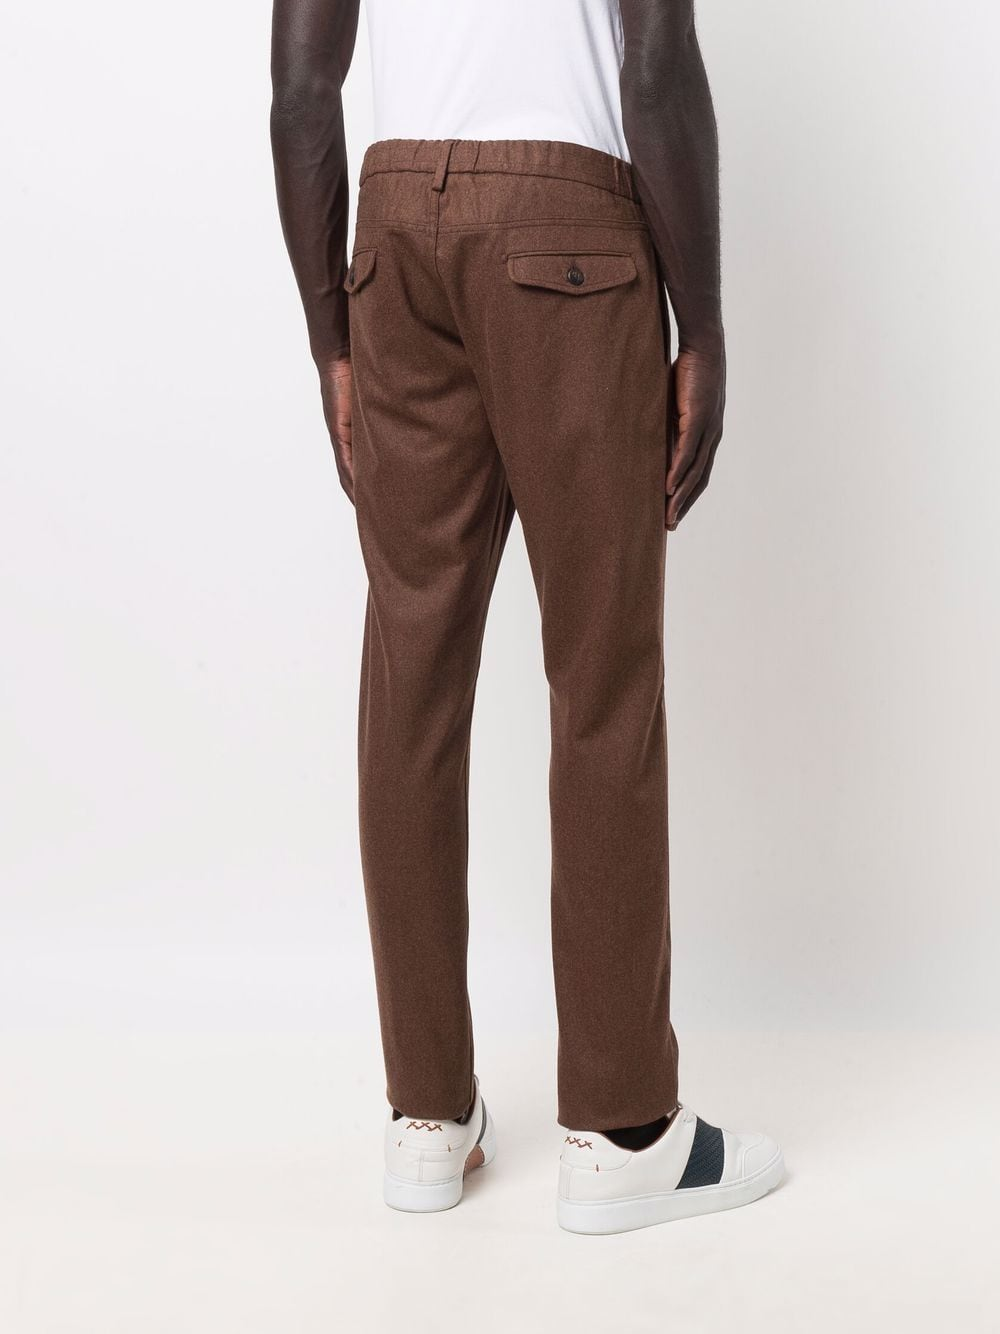 pantalone sartoriale testa di moro in lana e cashmere con coulisse ELEVENTY | Pantaloni | D75PANB21-TES0D03705